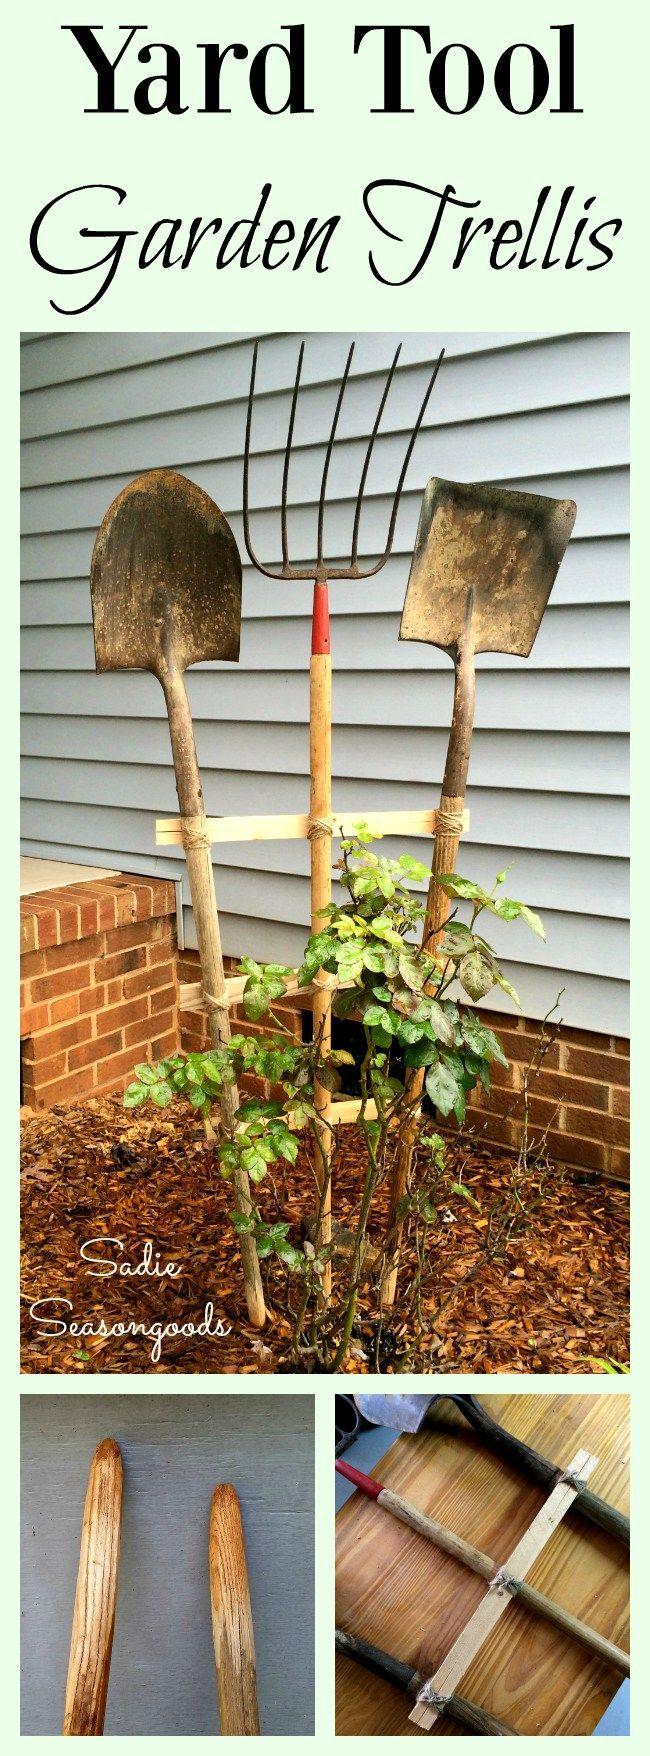 DIY Garden Trellis using Repurposed Vintage Yard Tools